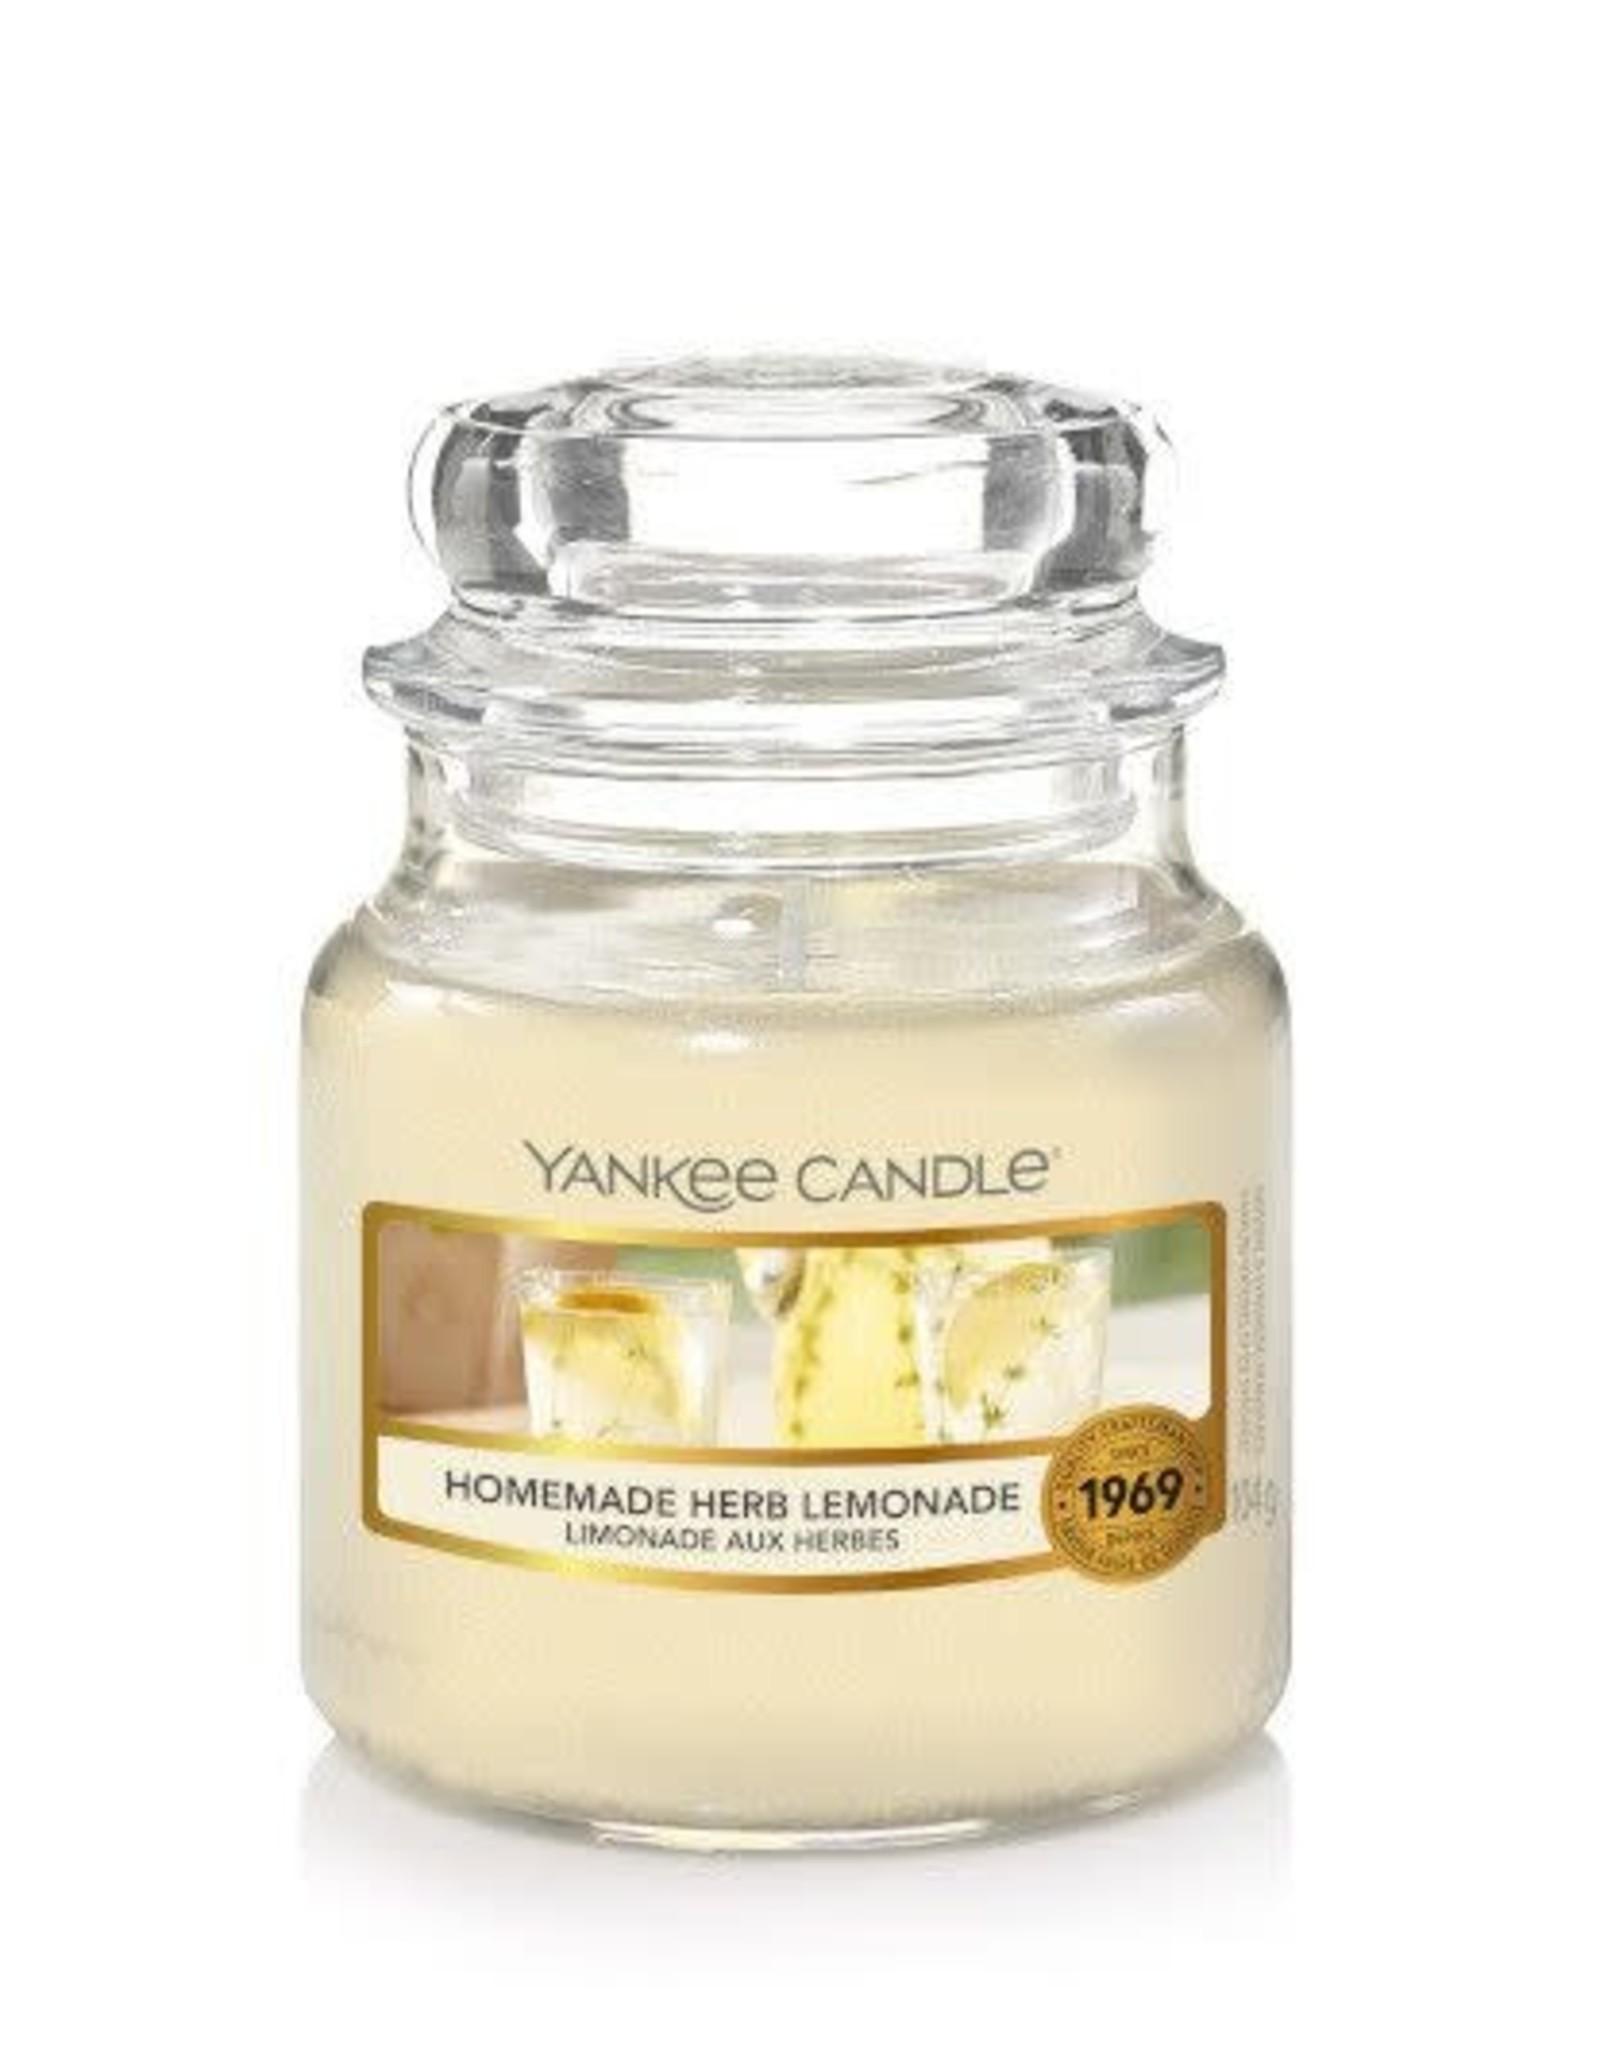 Yankee Candle Homemade Herb Lemonade Yankee Candle Medium